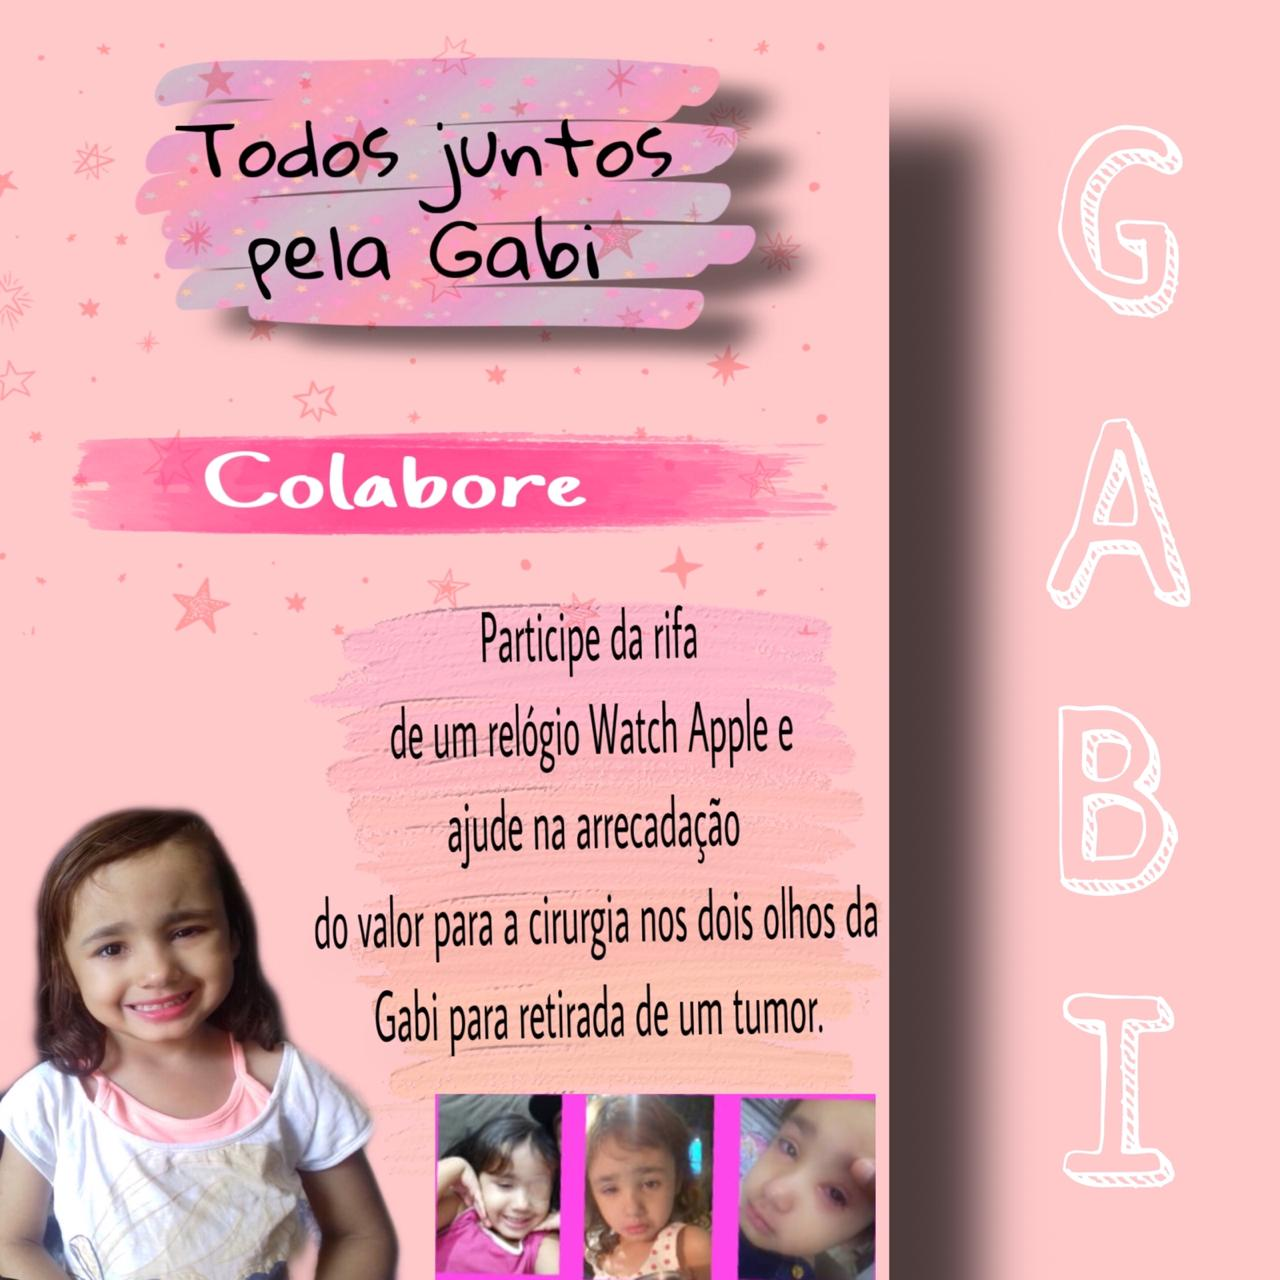 Foto  - Todos juntos pela Gabi